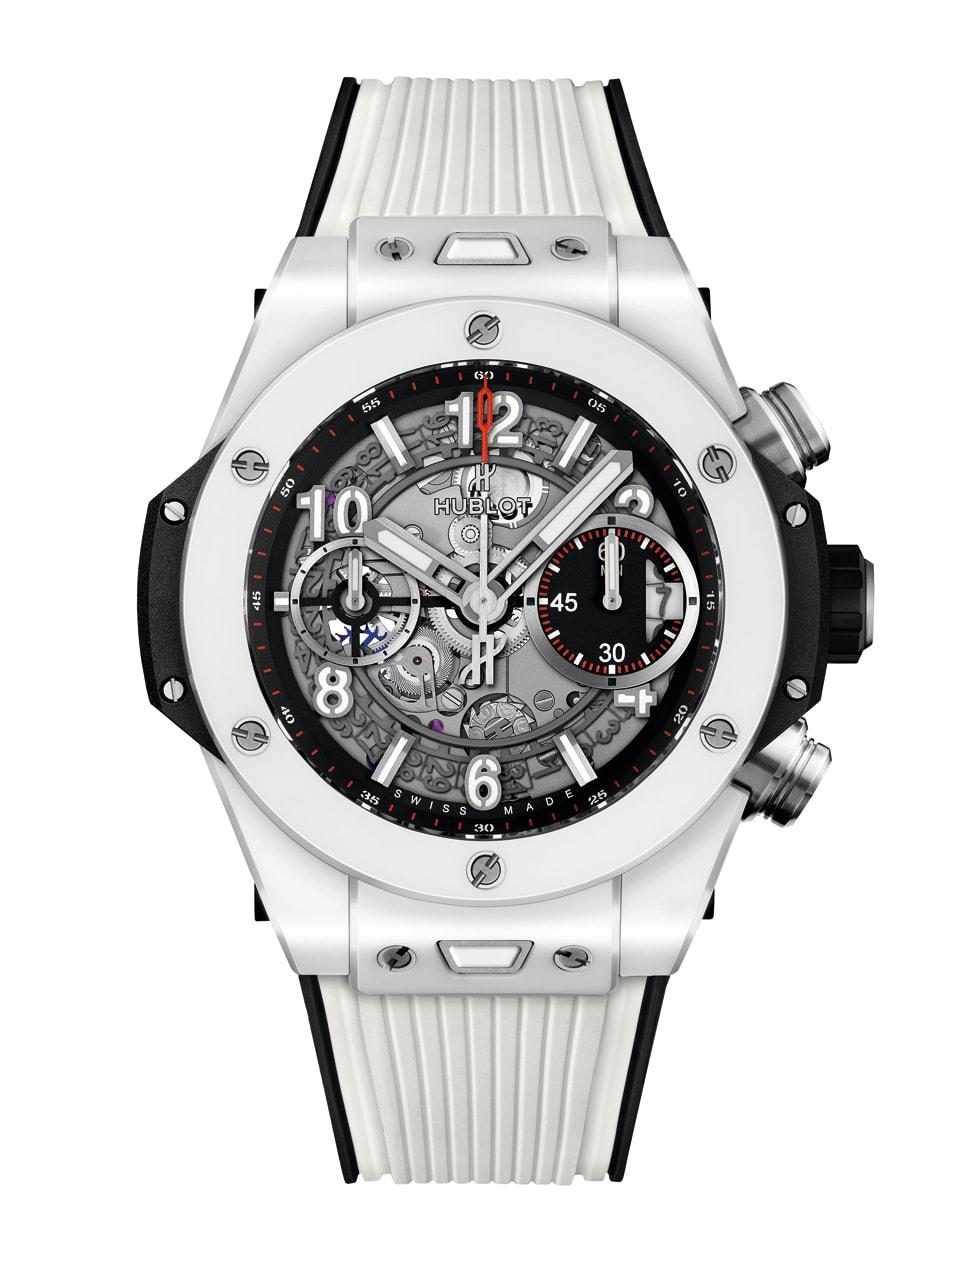 Watches of Switzerland